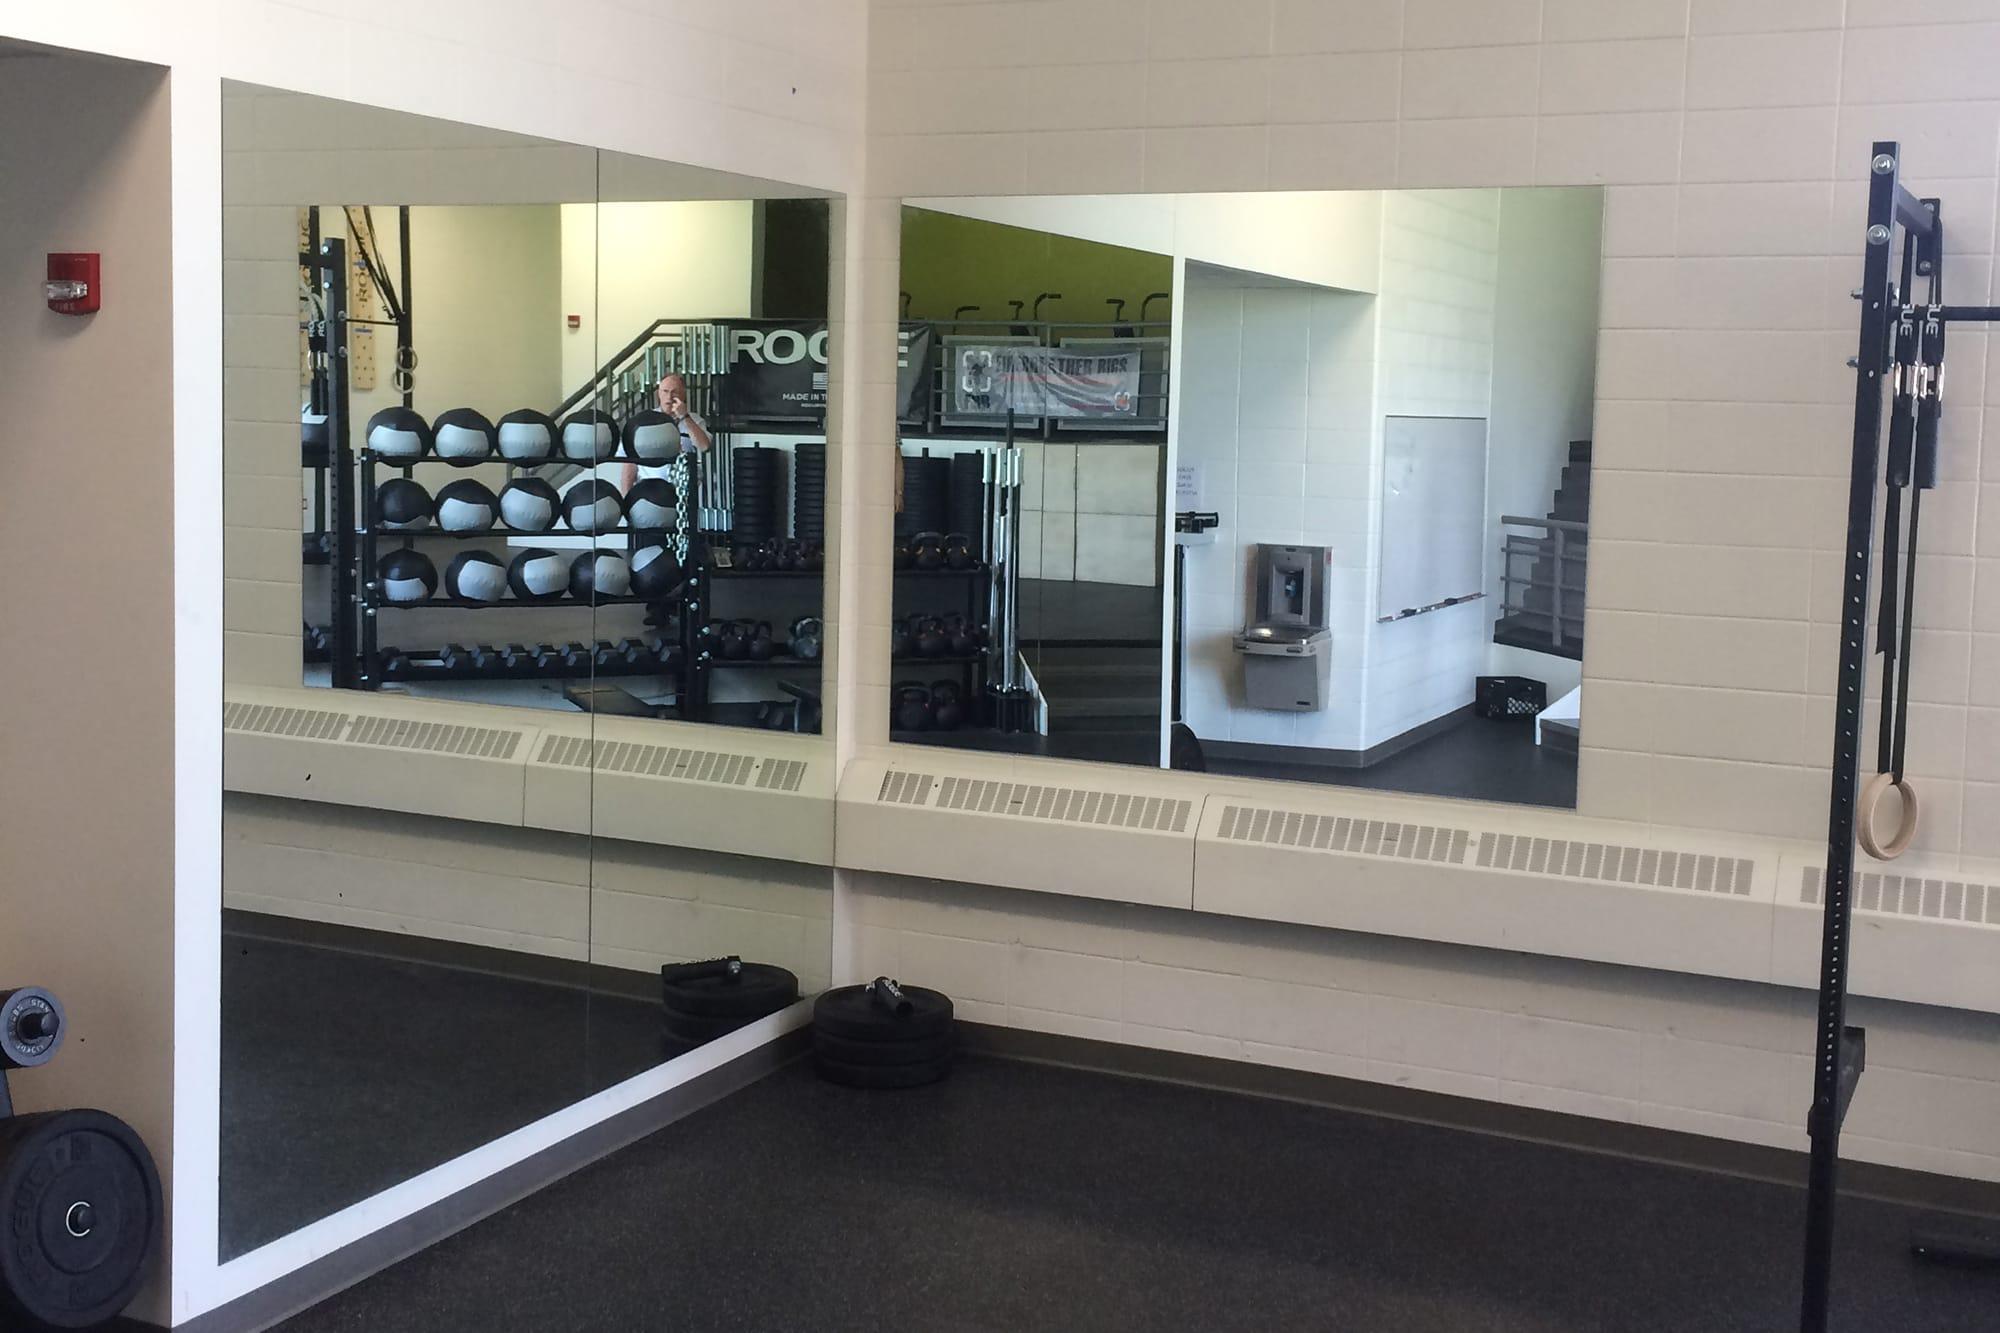 Foothills Composite High School interior